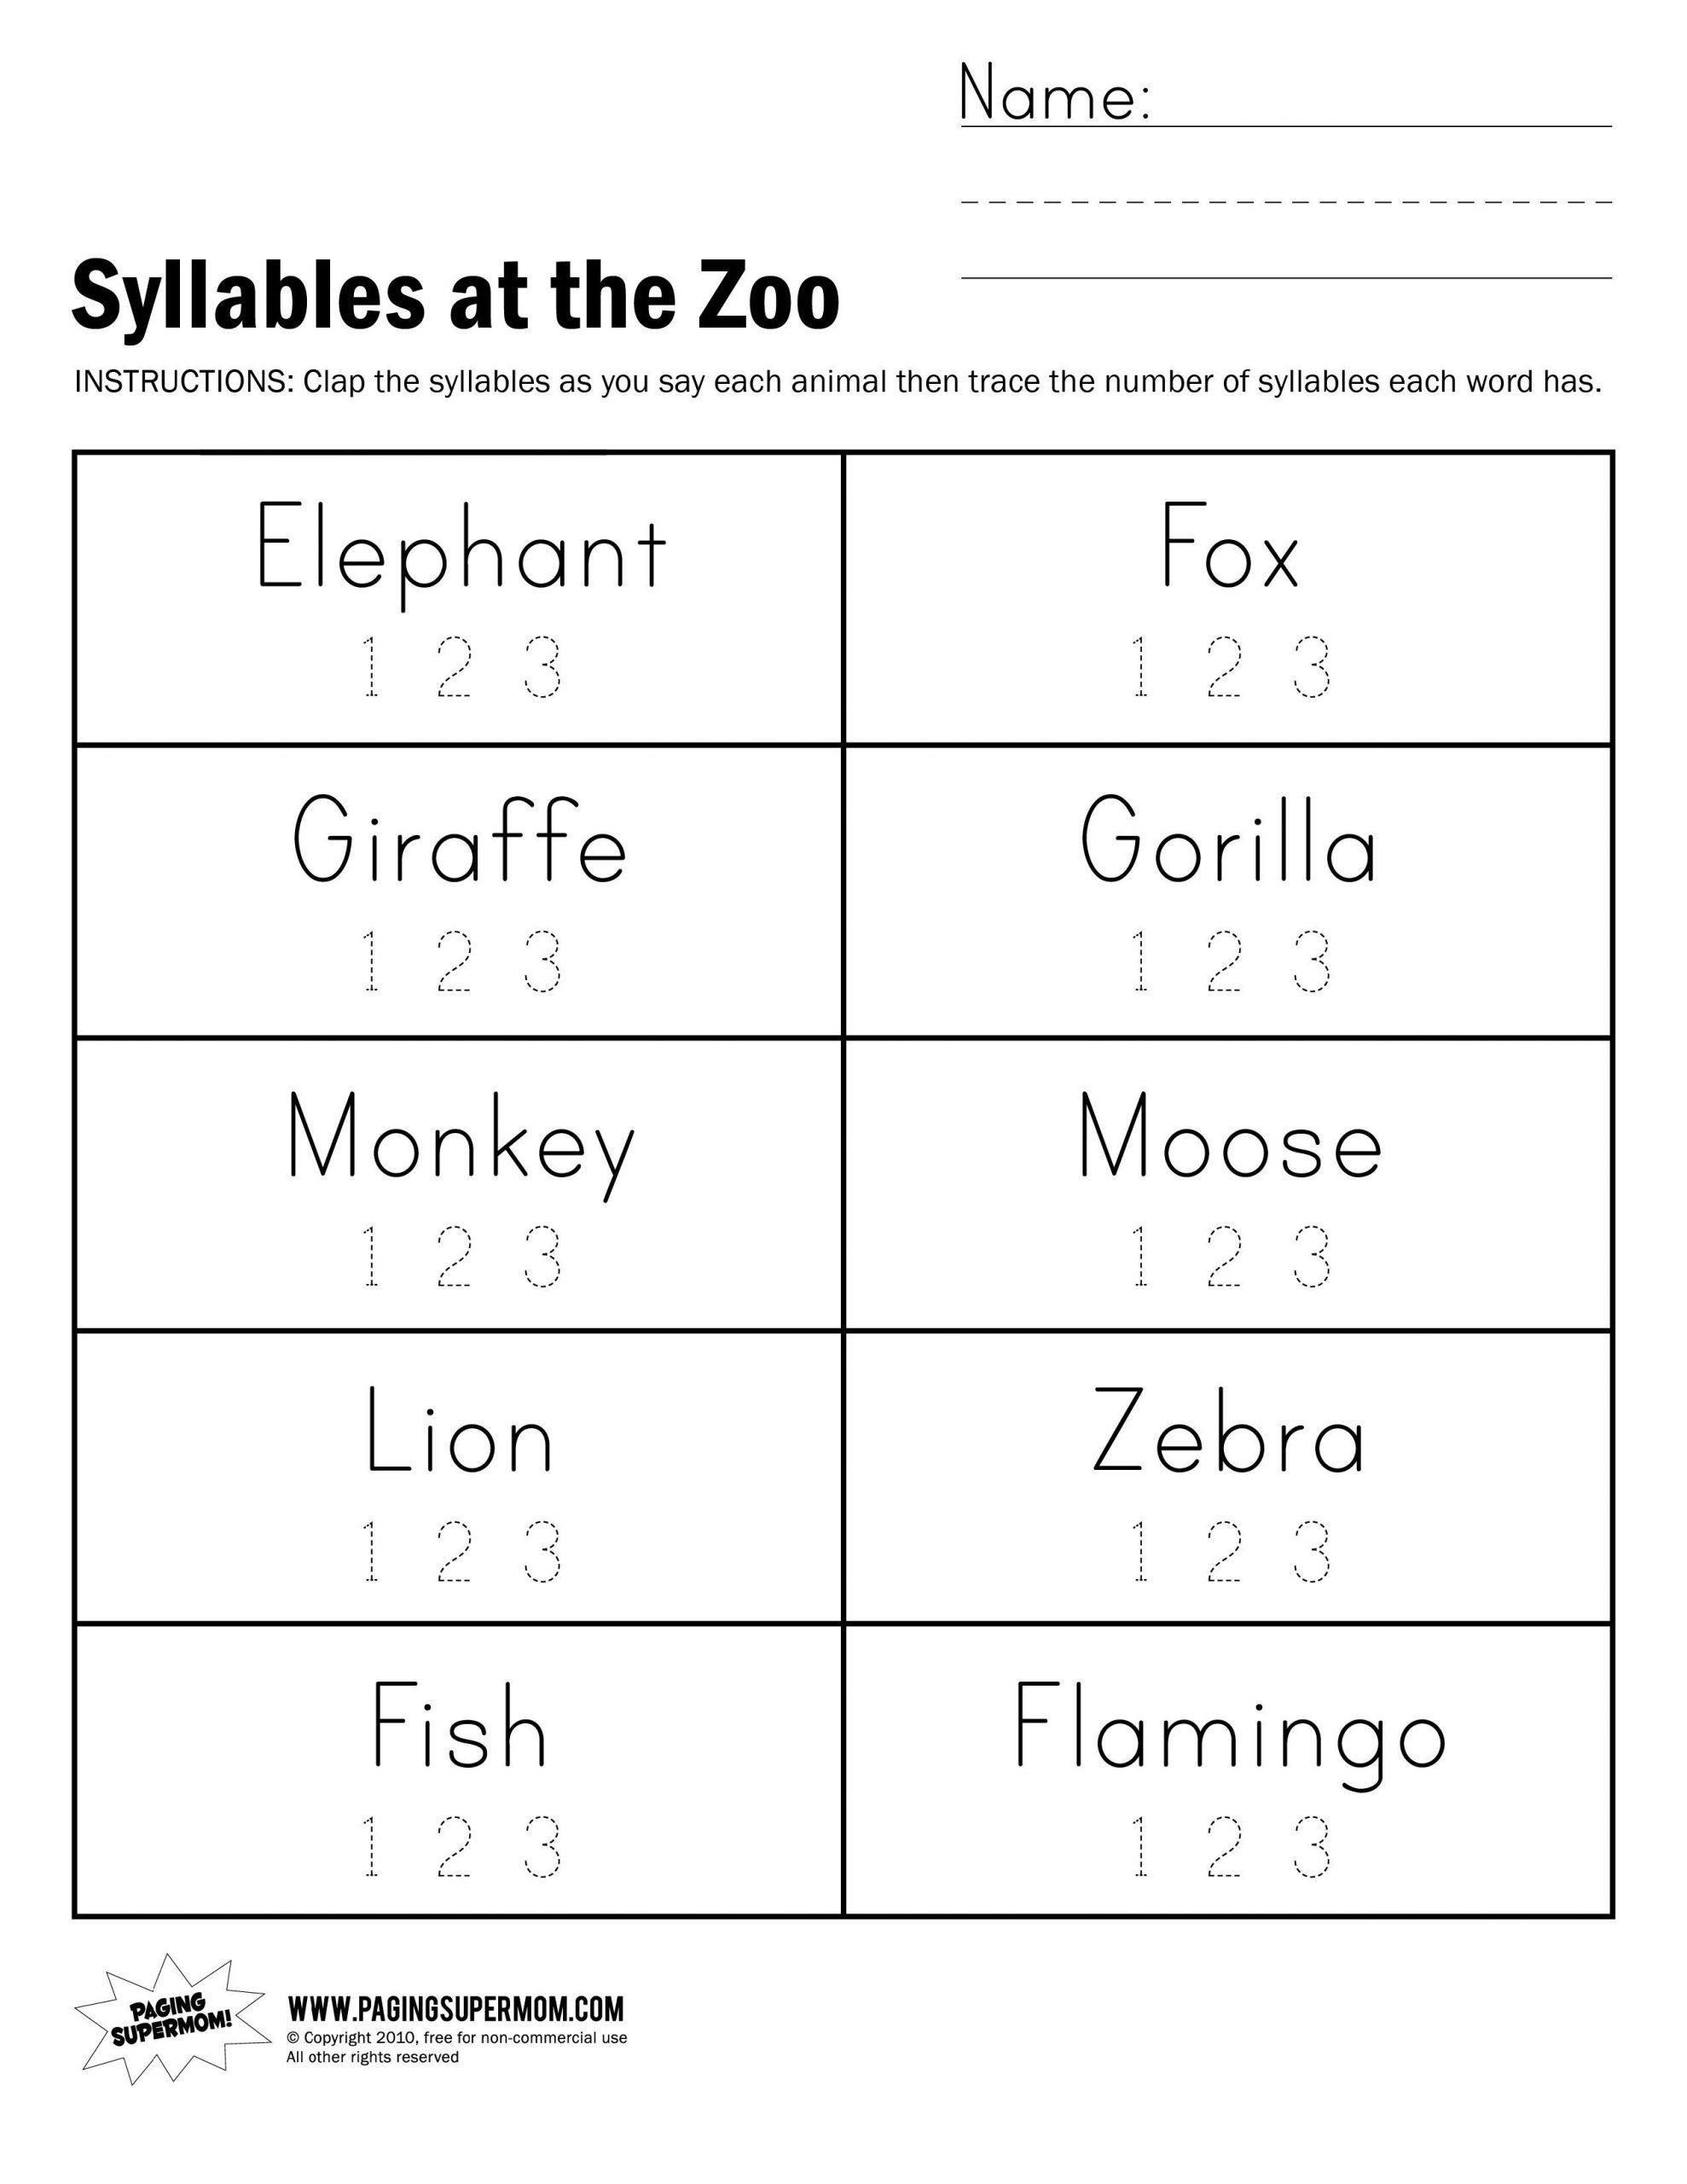 Closed Syllable Worksheets First Grade Syllables At The Zoo Worksheet In 2020 Syllable Worksheet Compound Words Worksheets Kindergarten Worksheets